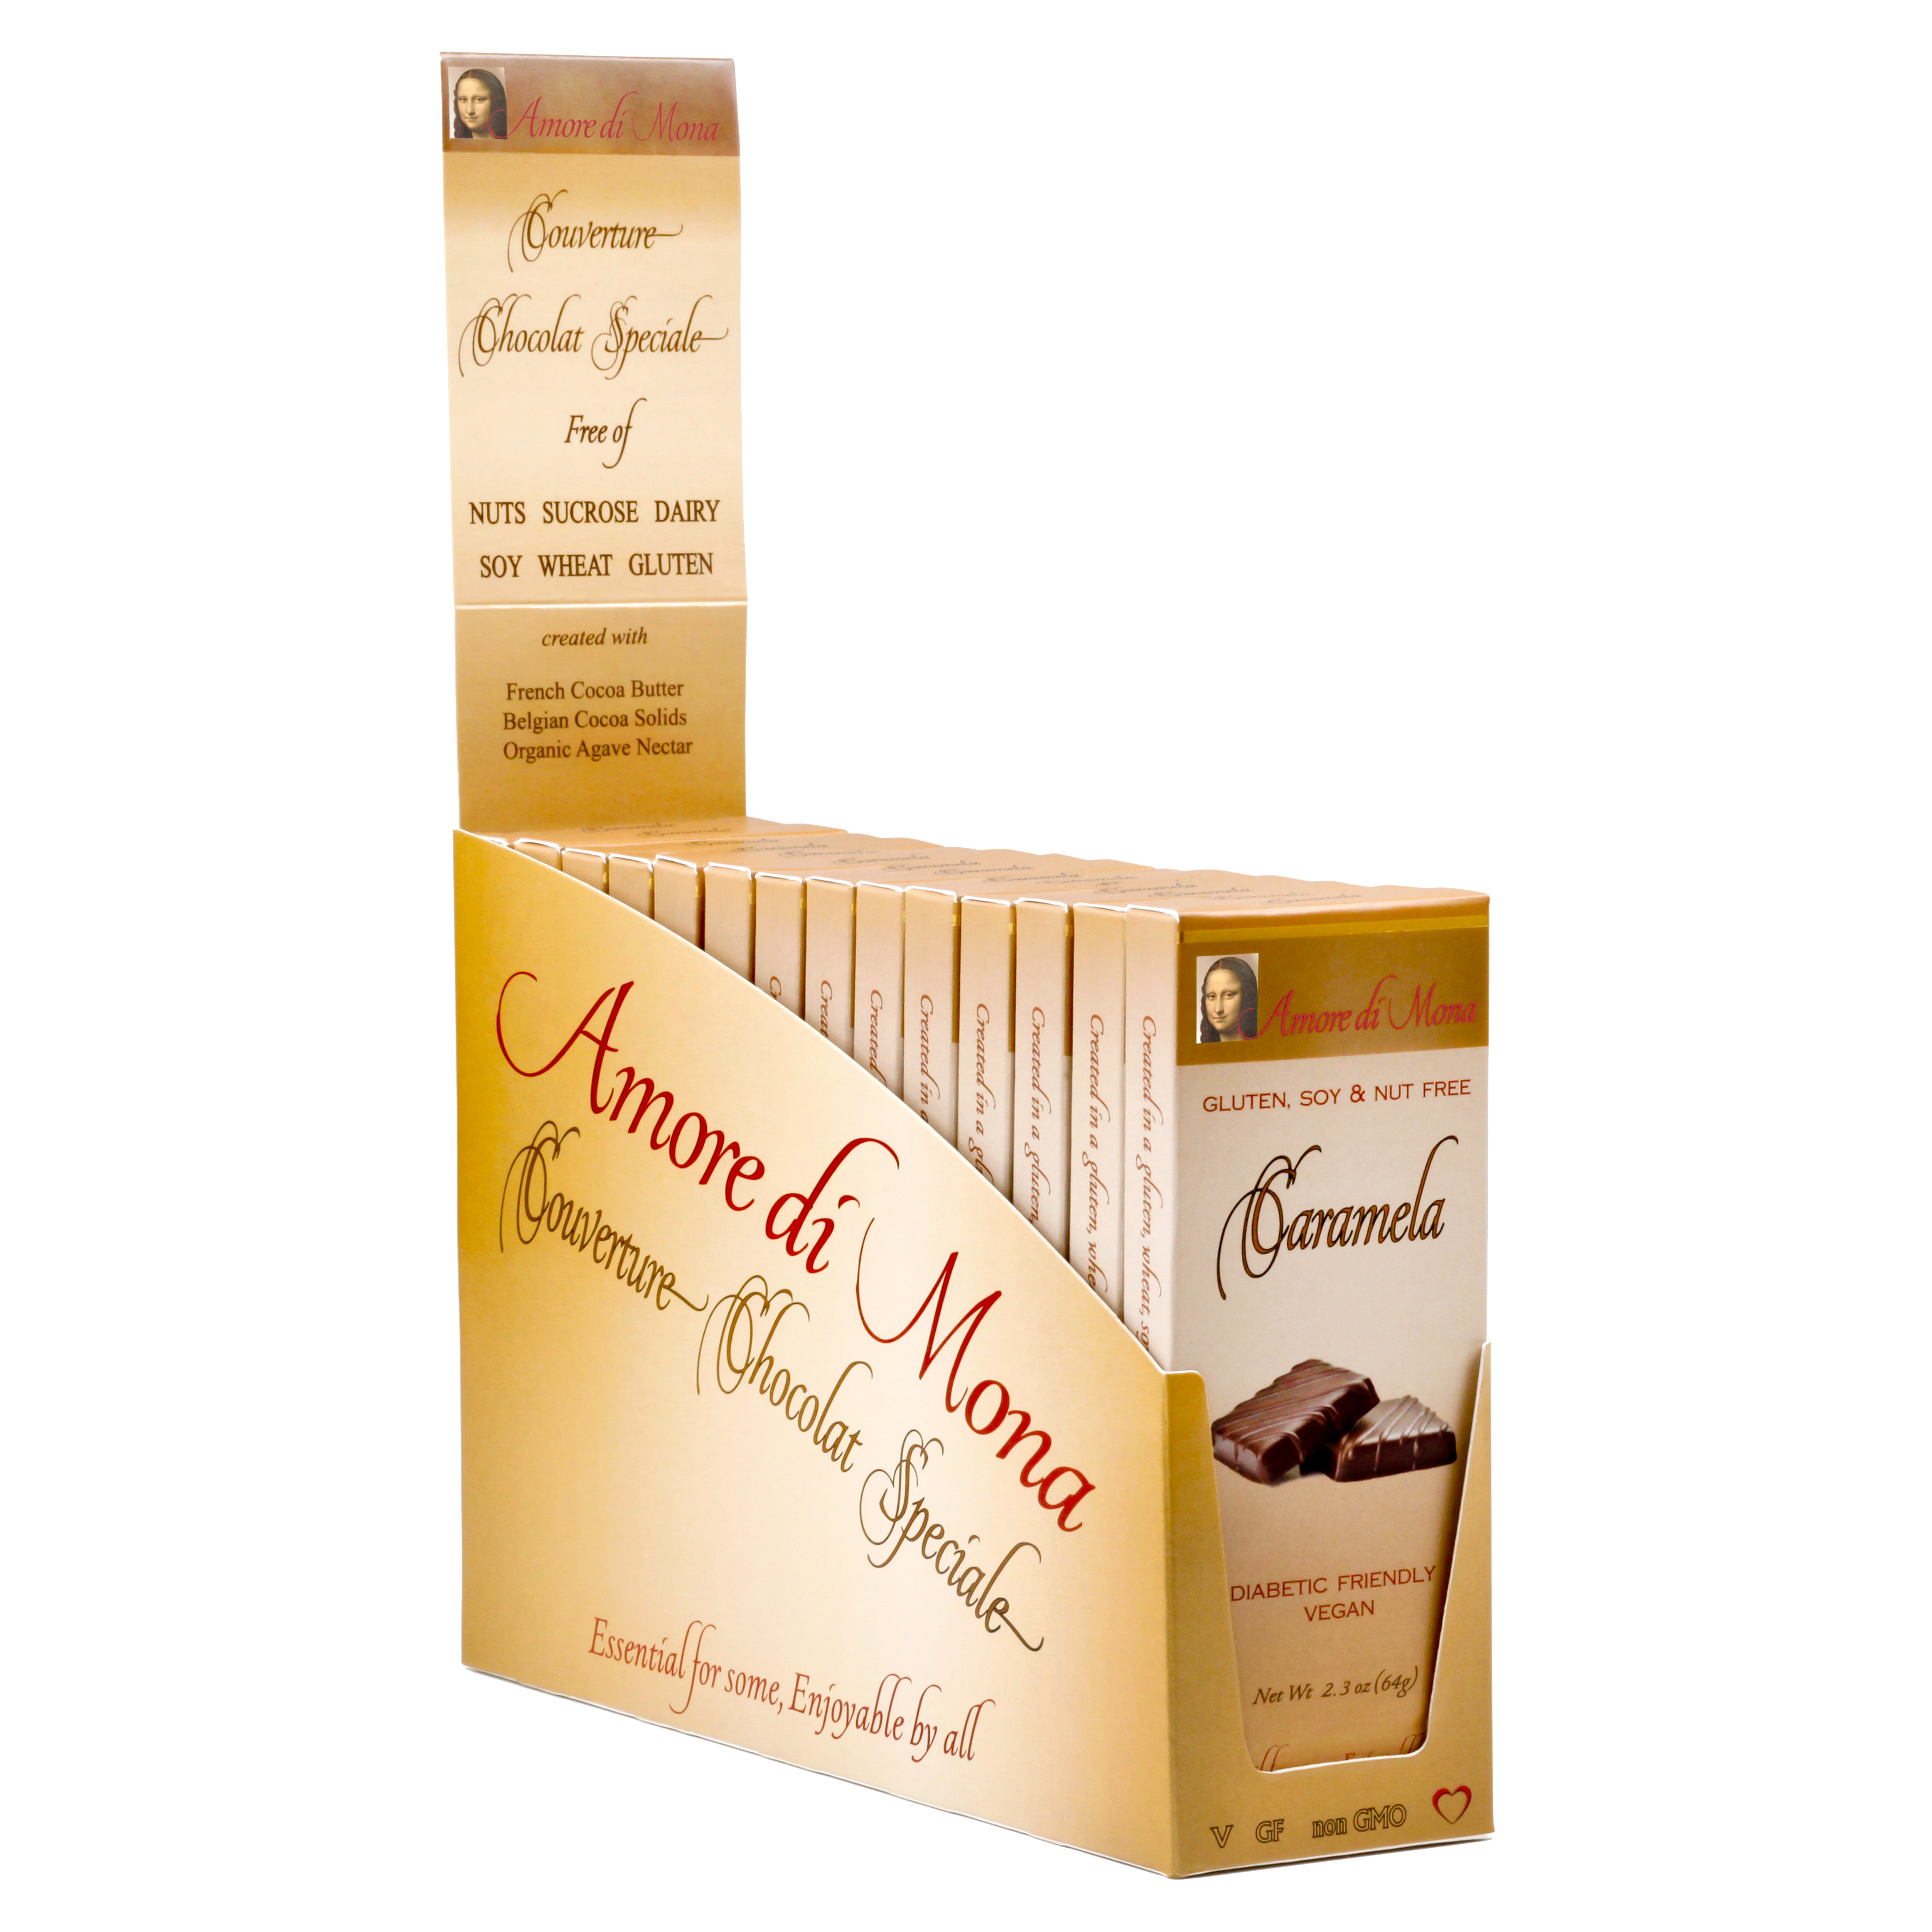 Caramela - Case of 14, 2 5 oz Bars